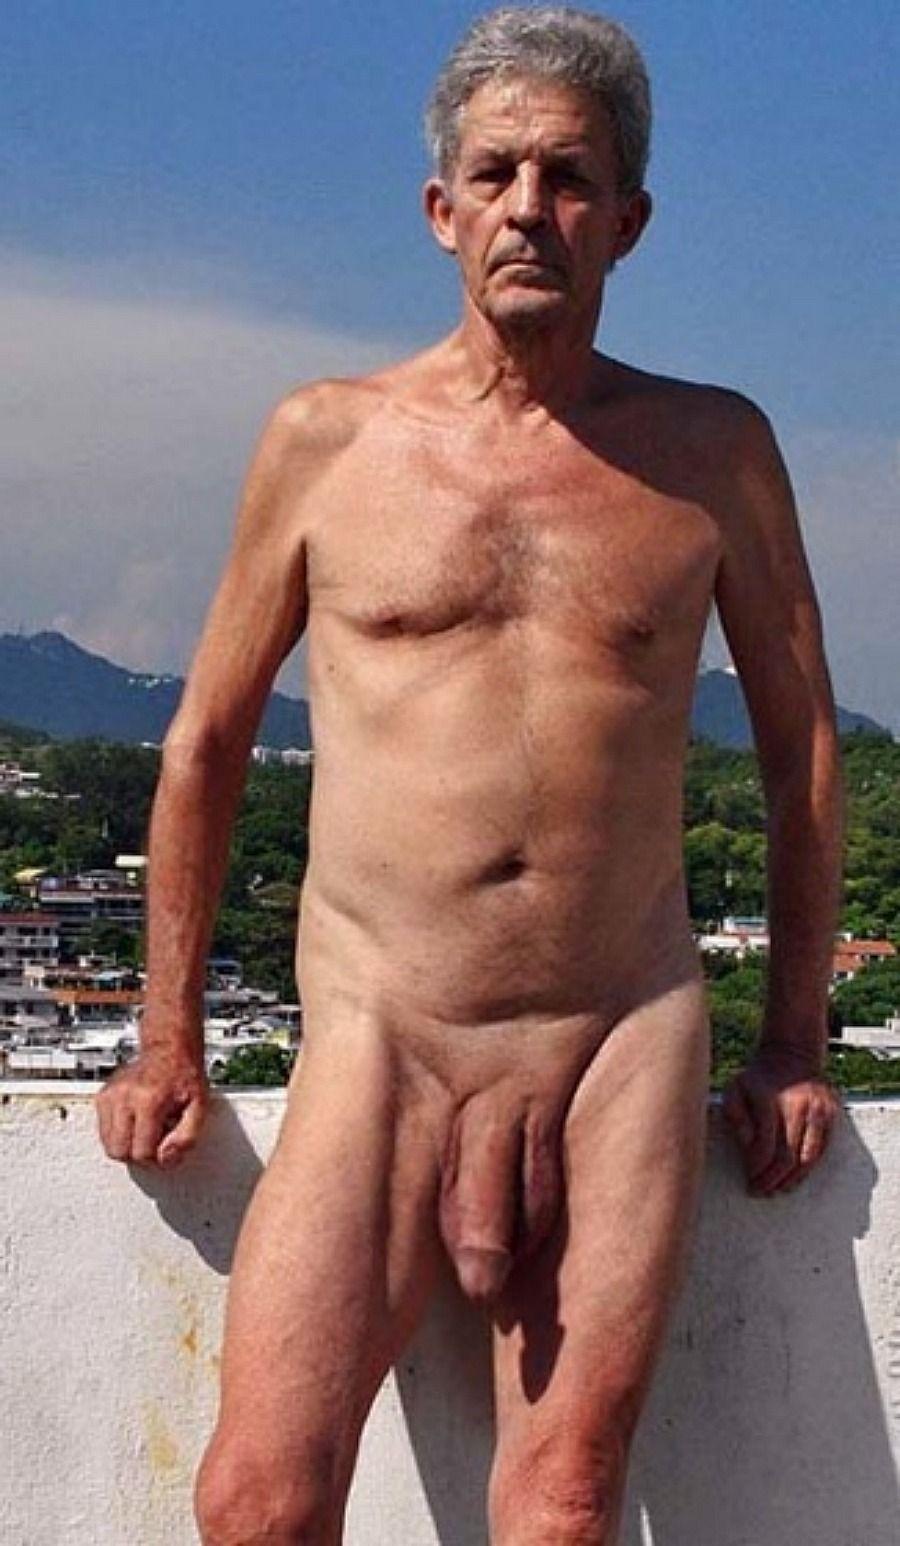 Old man big dick nudes